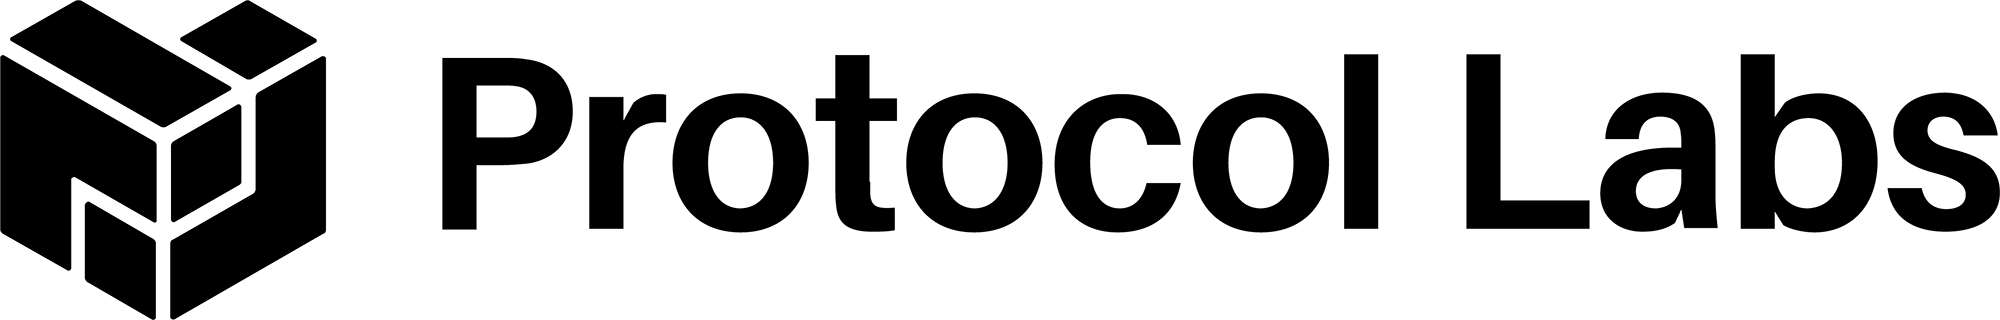 Protocol labs.b5fe8a85 2